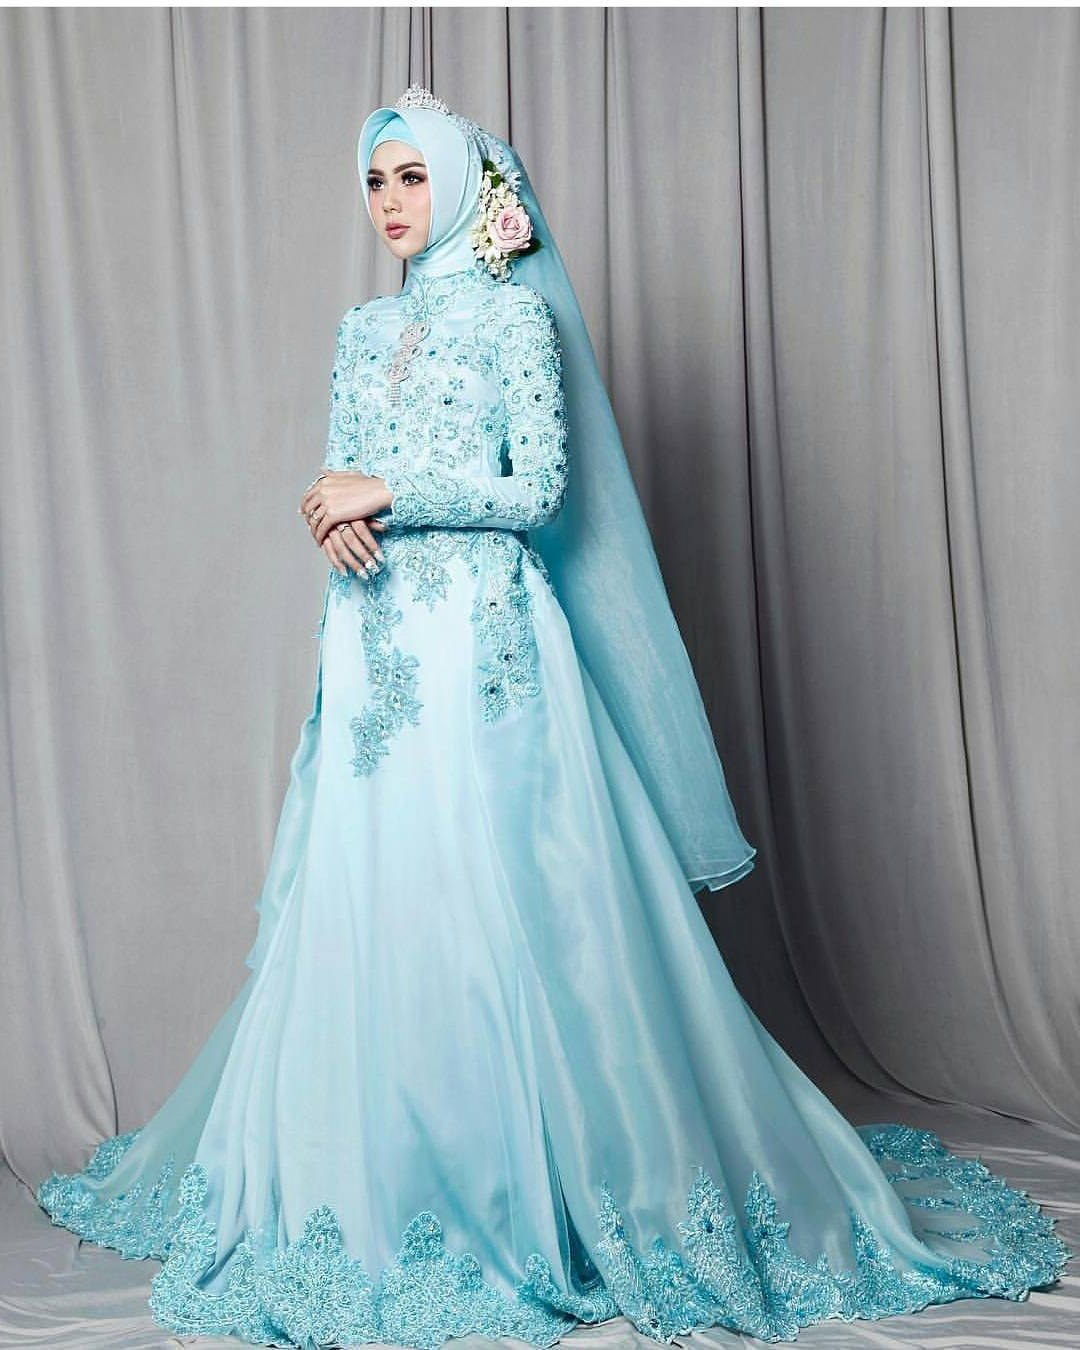 Ide Gaun Pengantin Muslimah Yang Syar'i S5d8 17 Model Baju Pengantin Muslim 2018 Desain Elegan Cantik